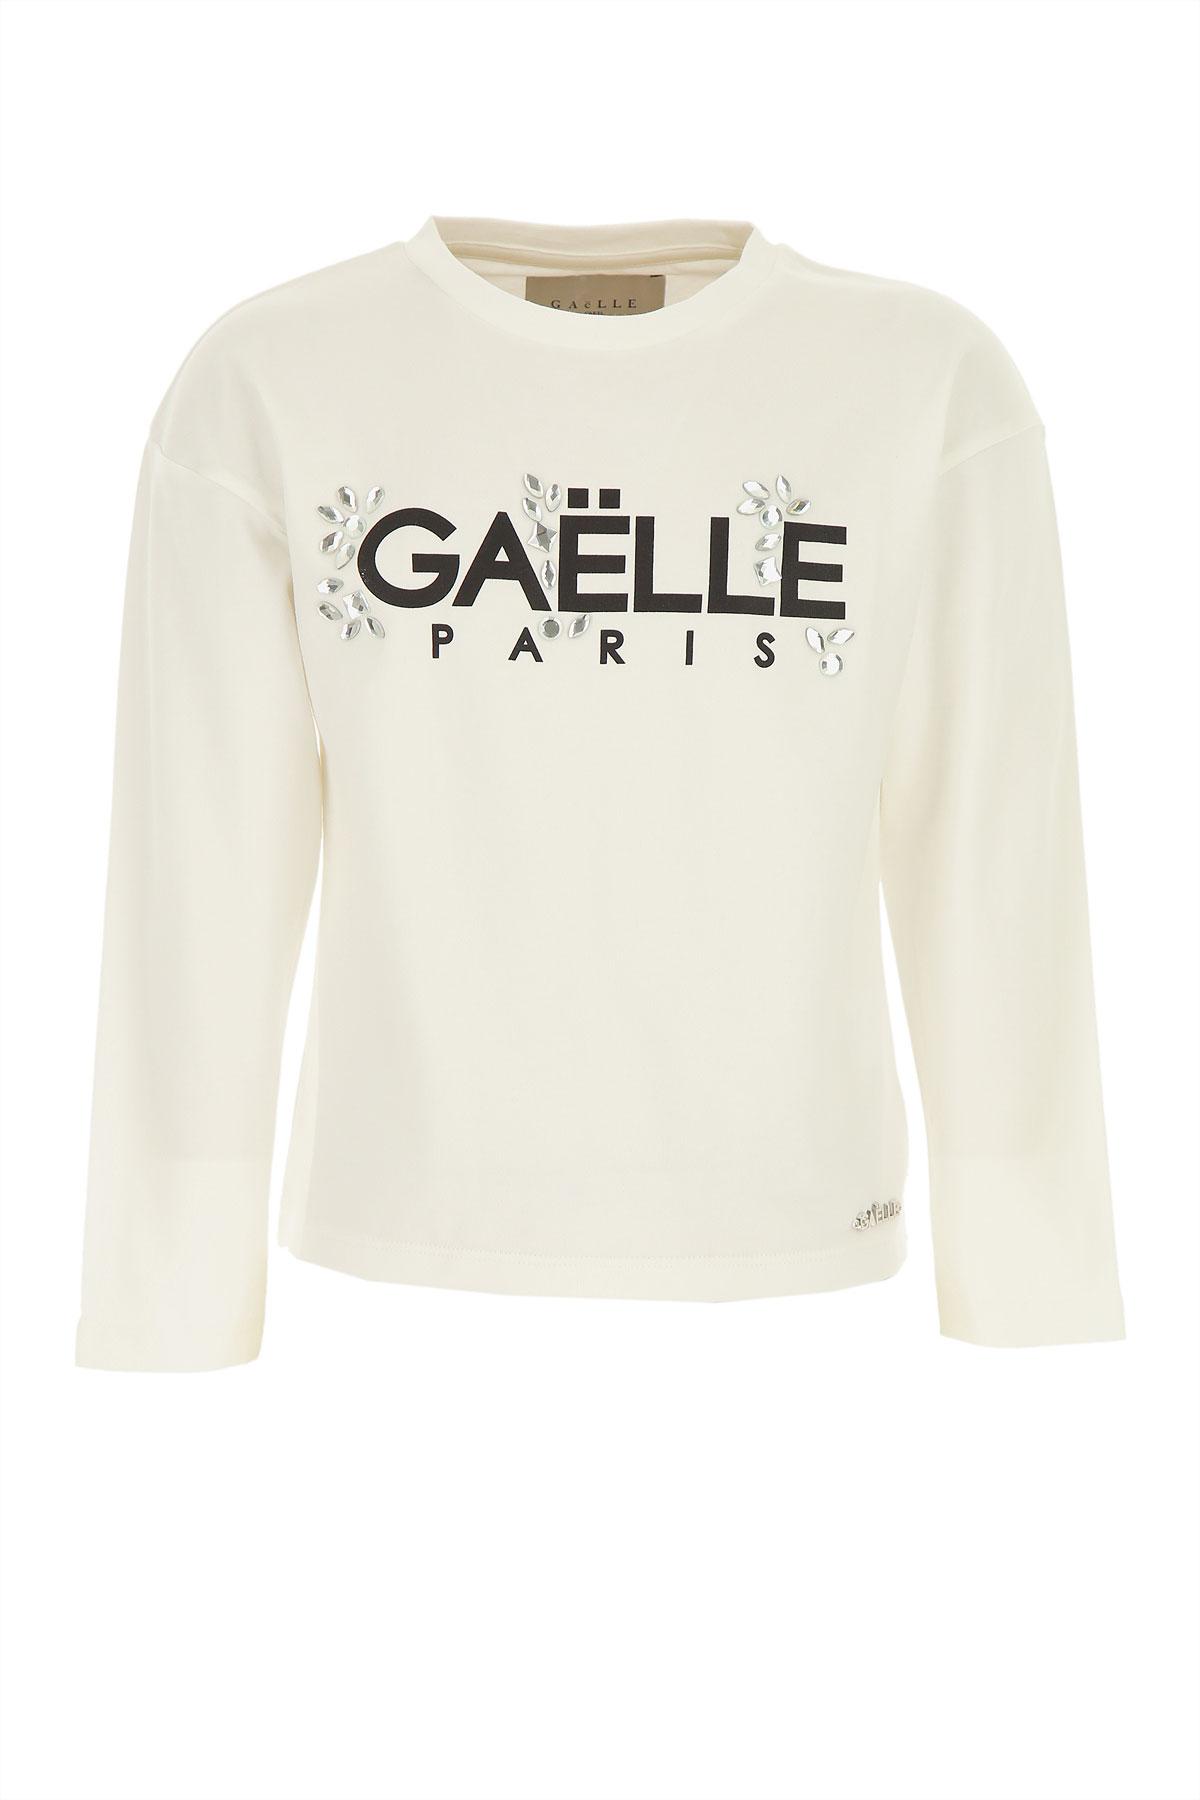 Gaelle Kids T-Shirt for Girls On Sale, White, Cotton, 2019, 14Y 16Y 6Y 8Y